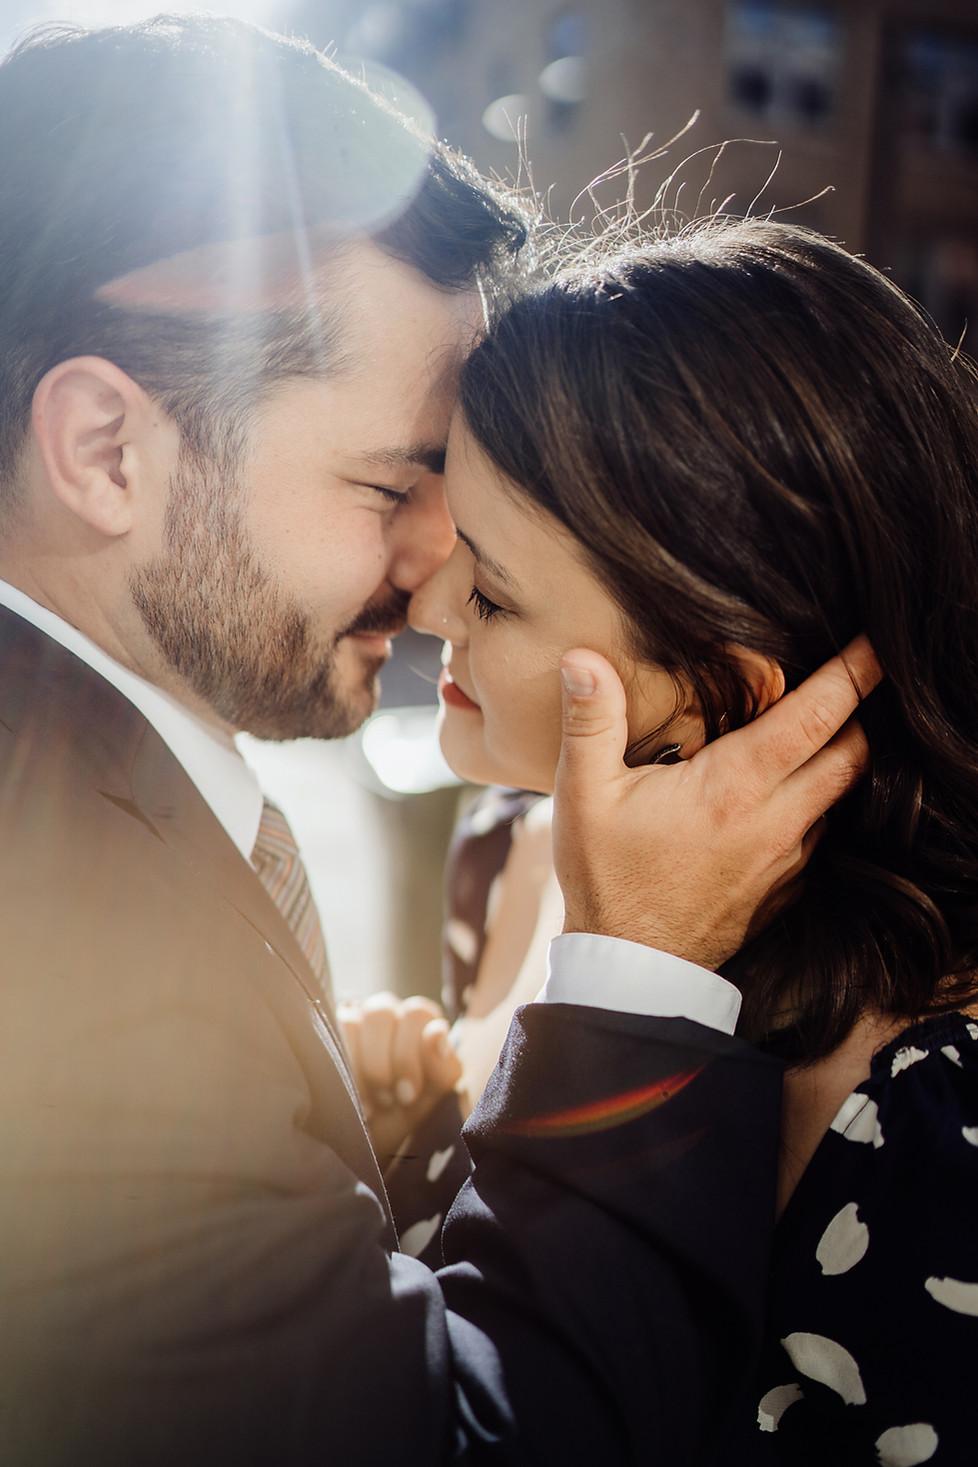 Lucas and Julia || Engagement session, OTR Cincinnati